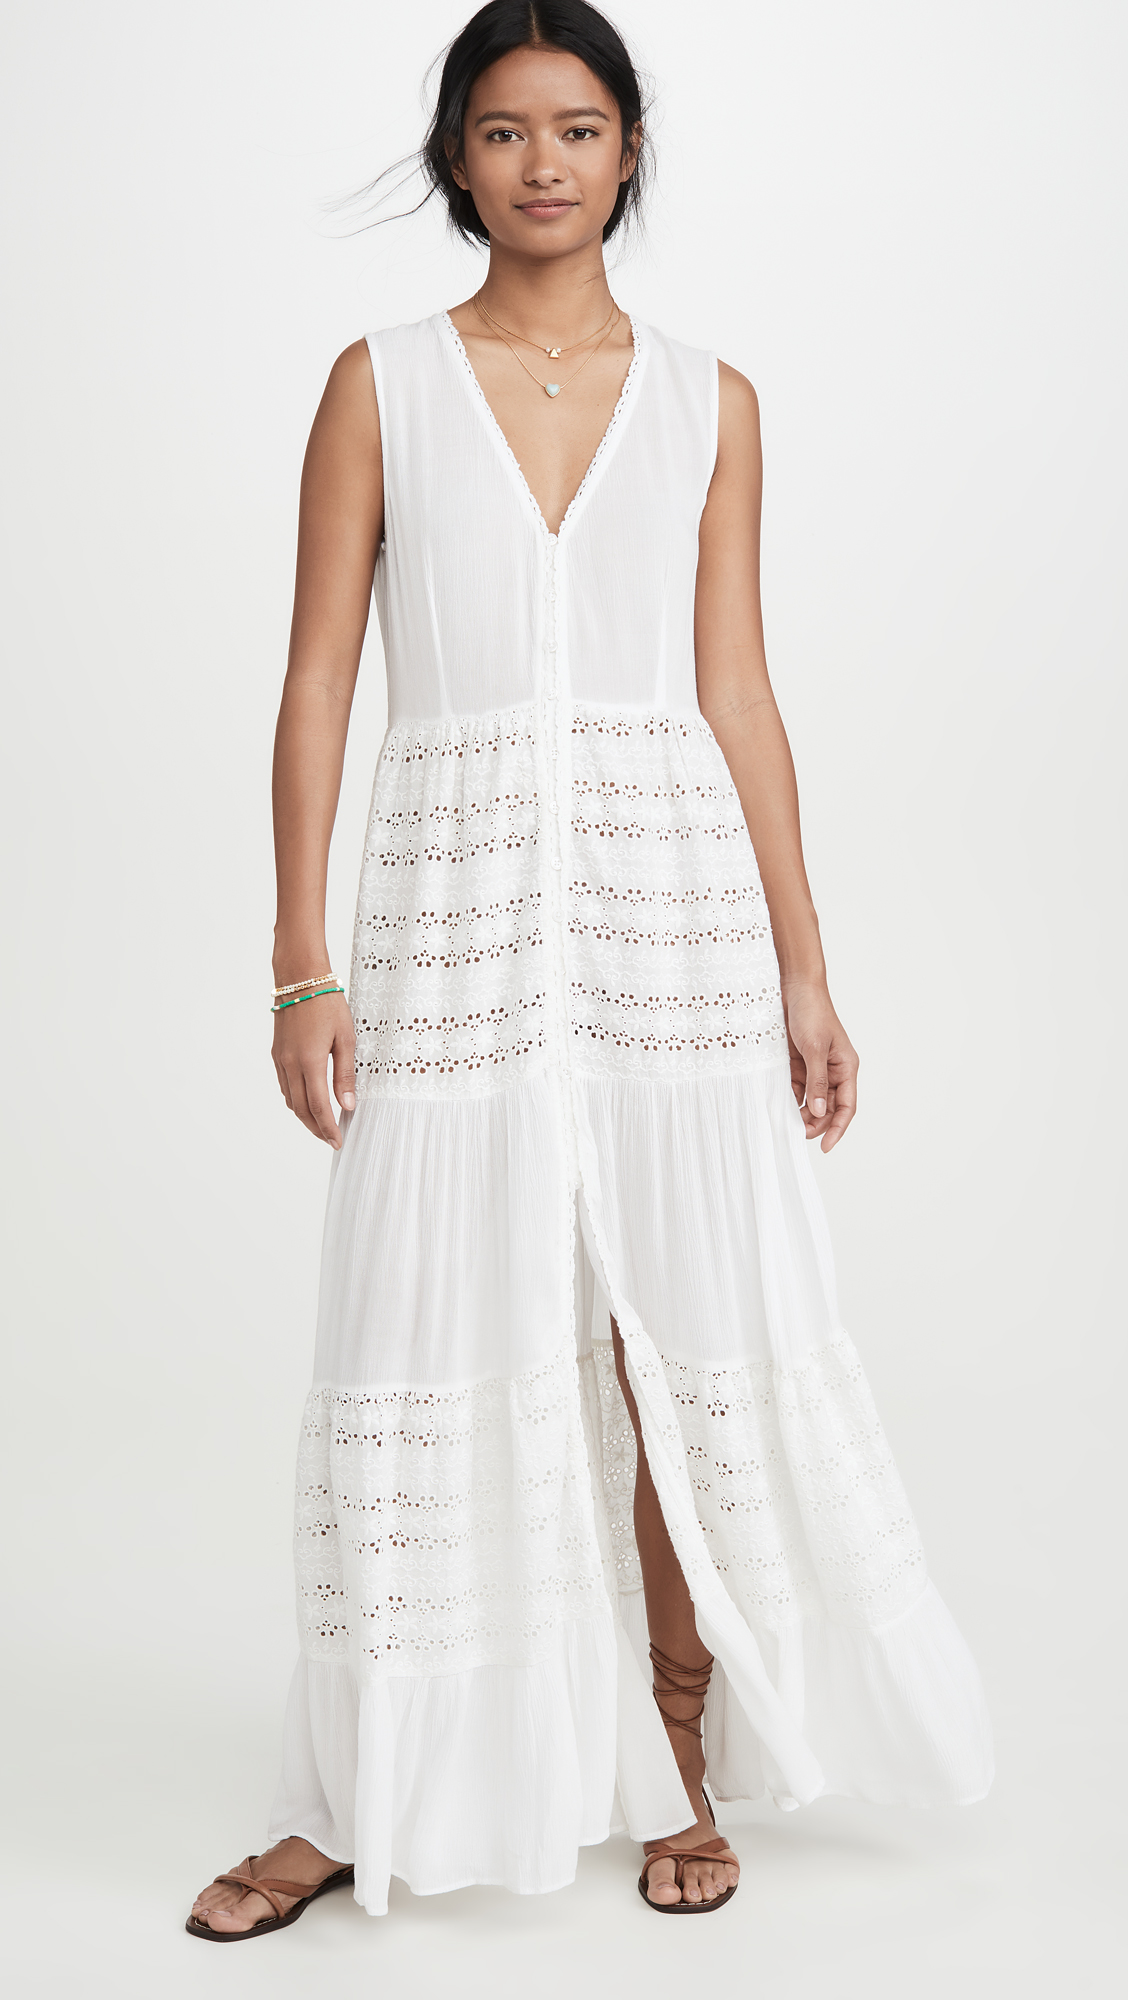 woman wearing Playa Lucila Eyelet white Maxi Dress and flat sandals